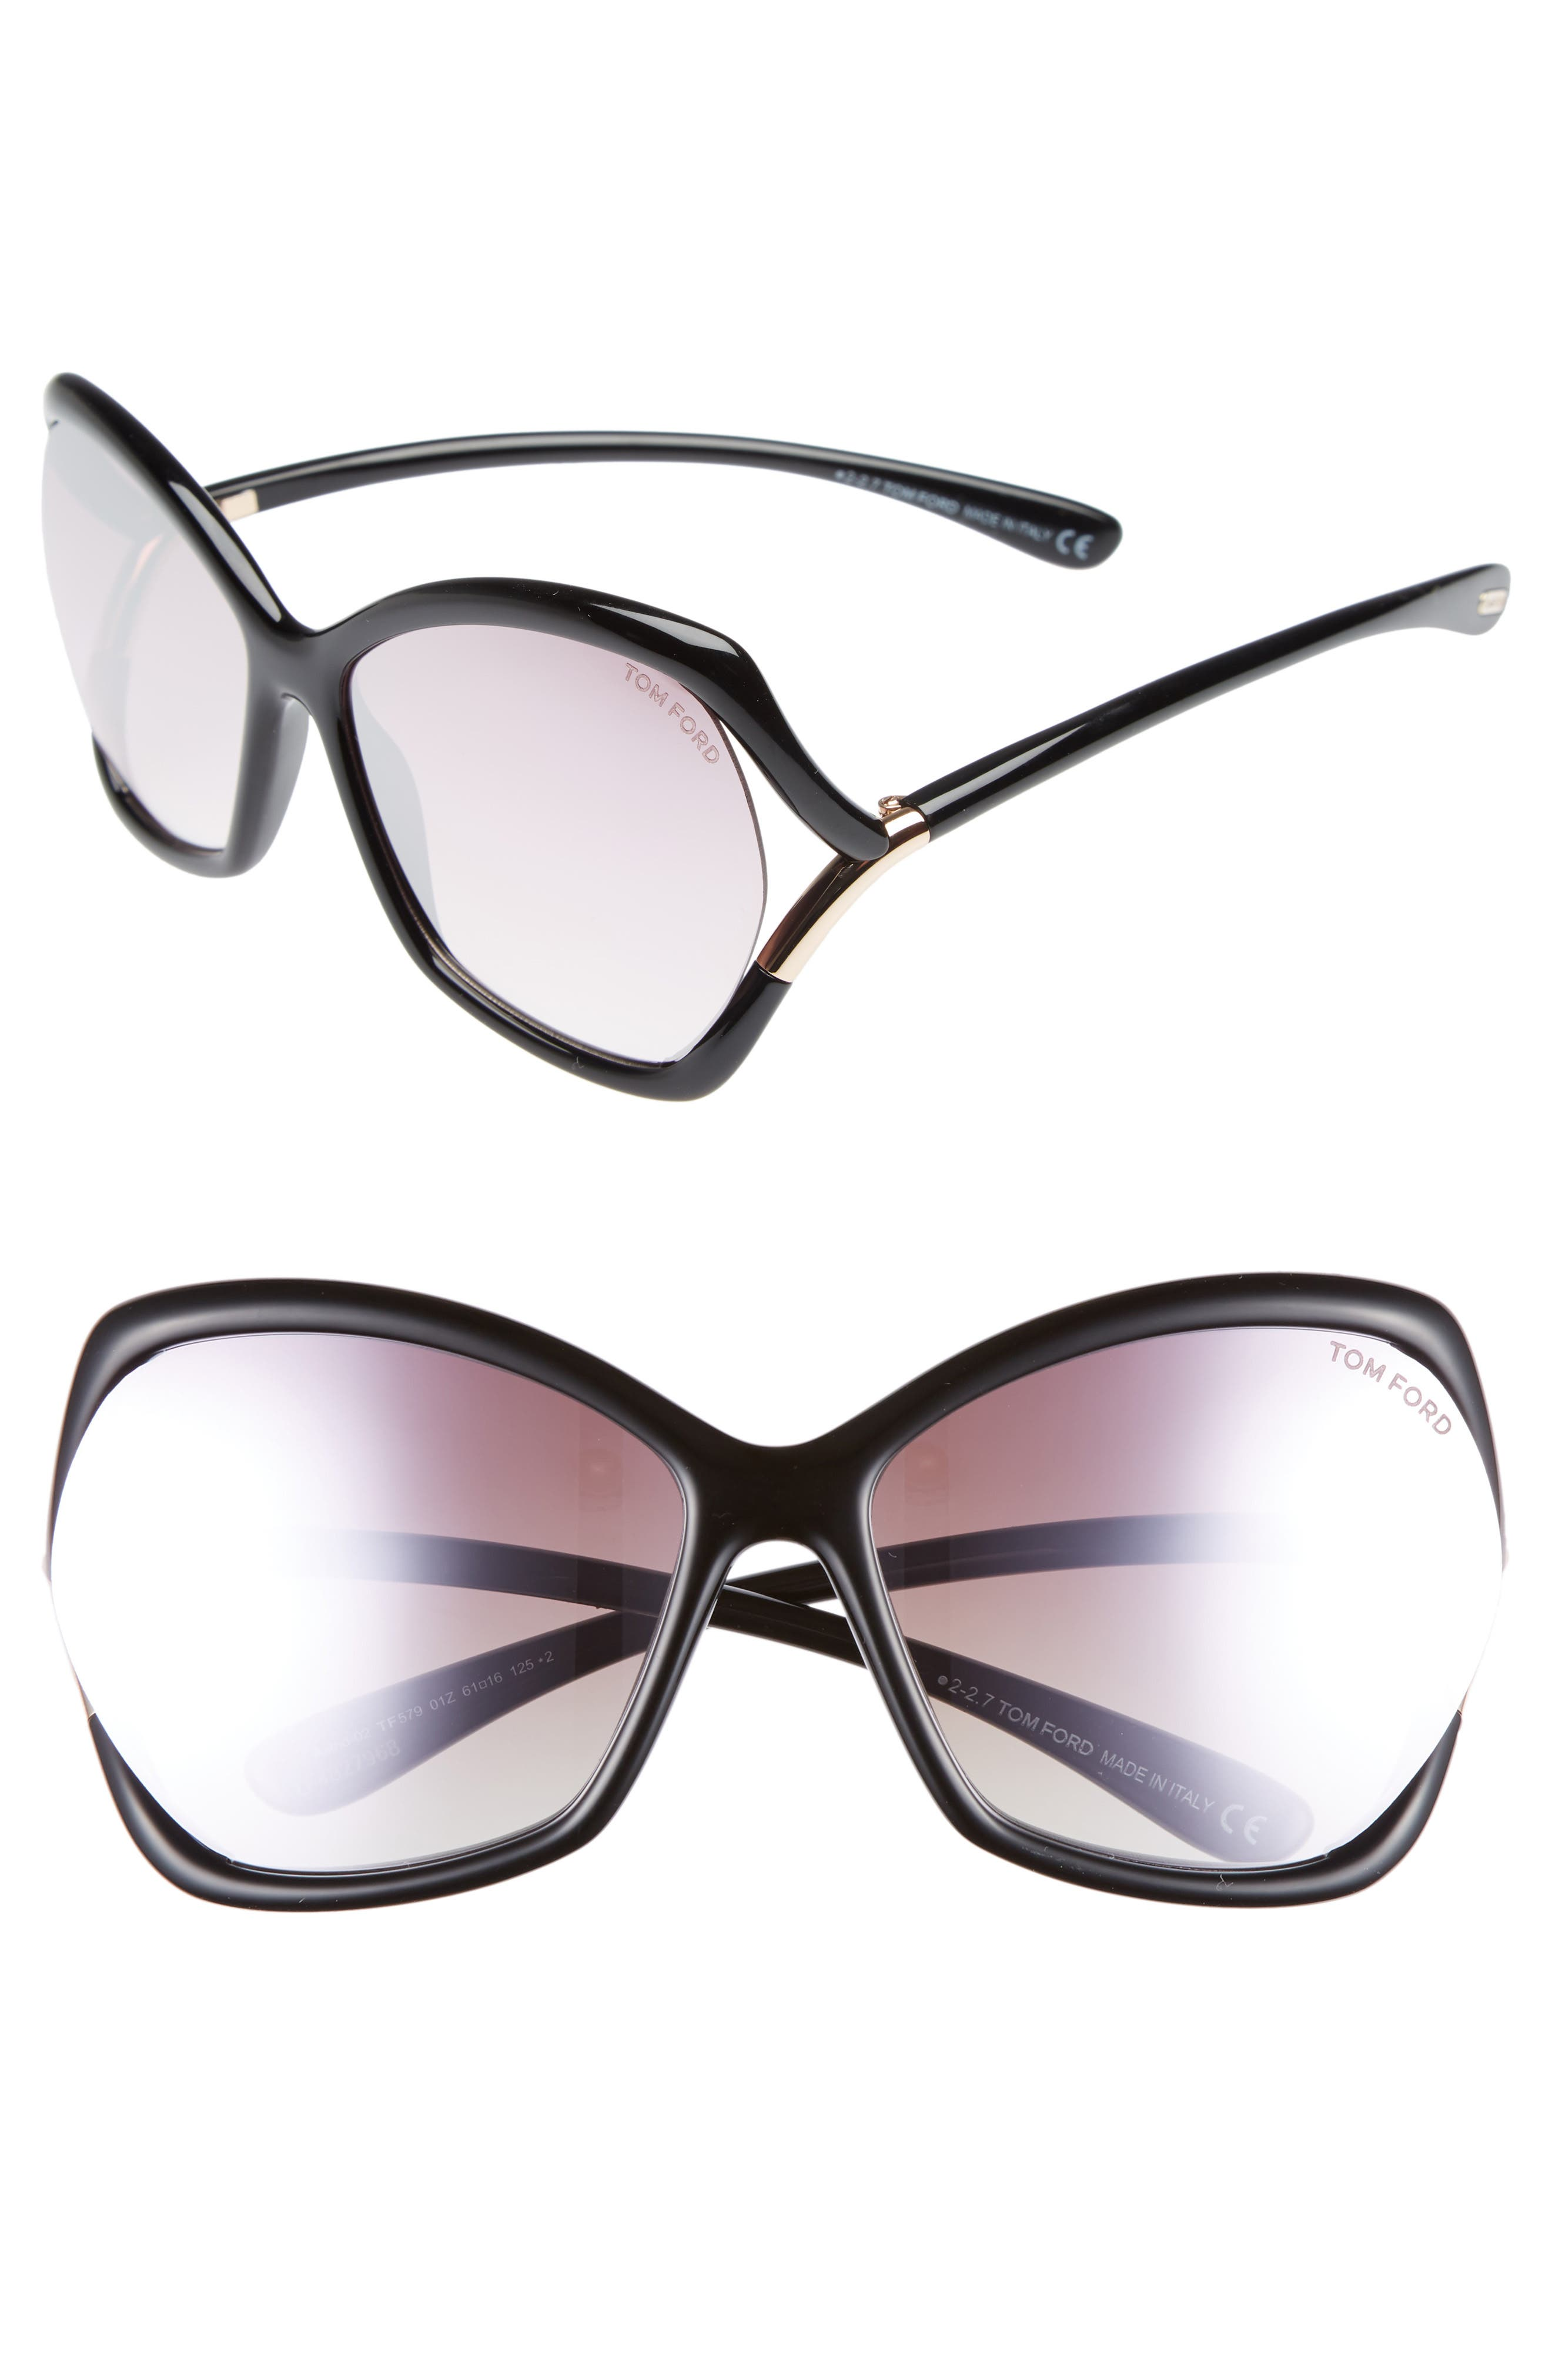 Tom Ford Astrid 61mm Geometric Sunglasses